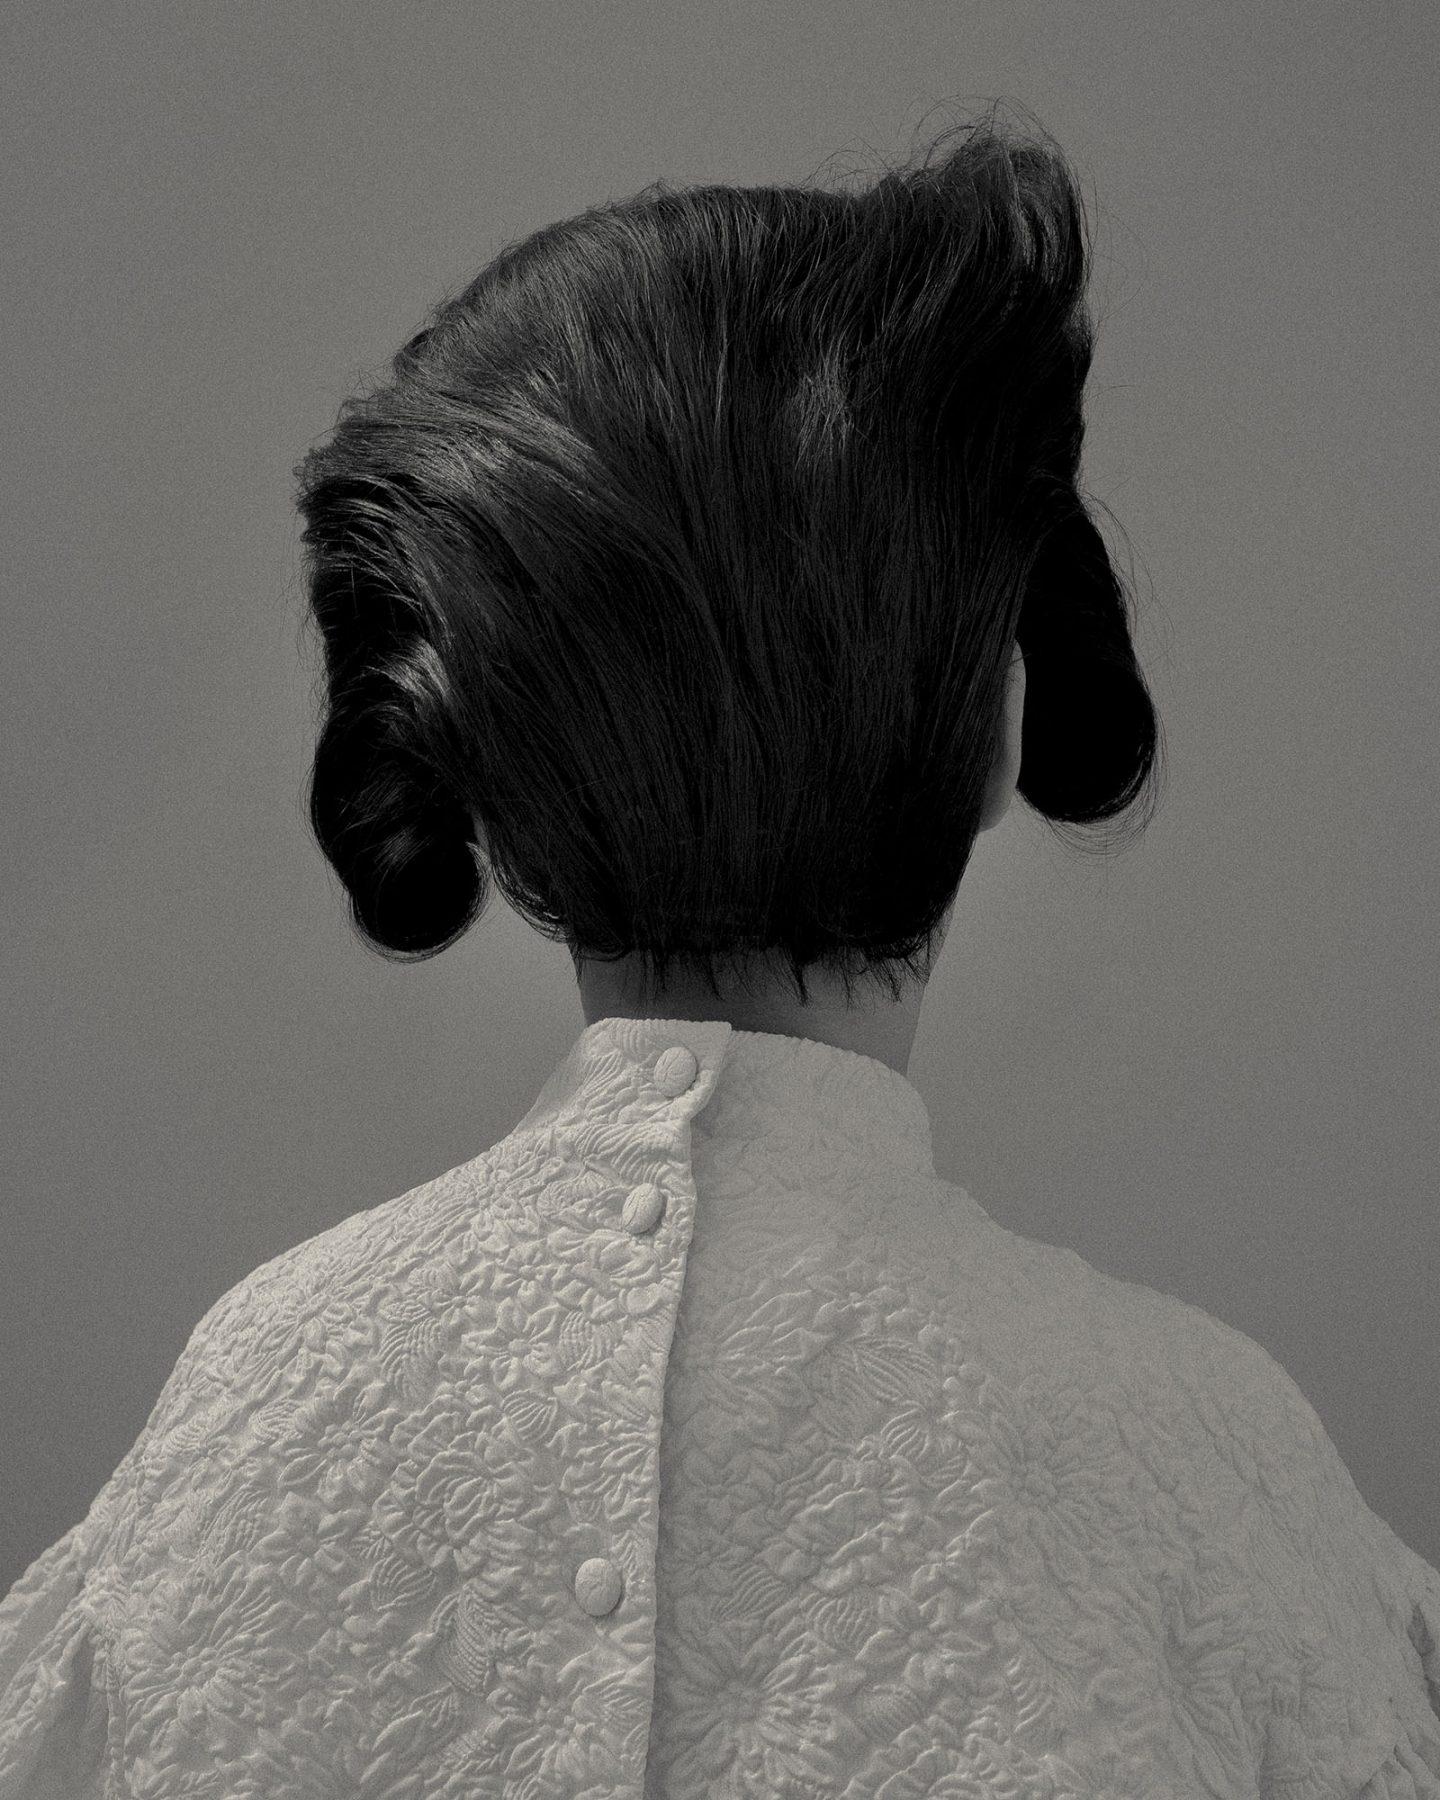 IGNANT-Photography-Paul-Phung-Toufa-Hair-03